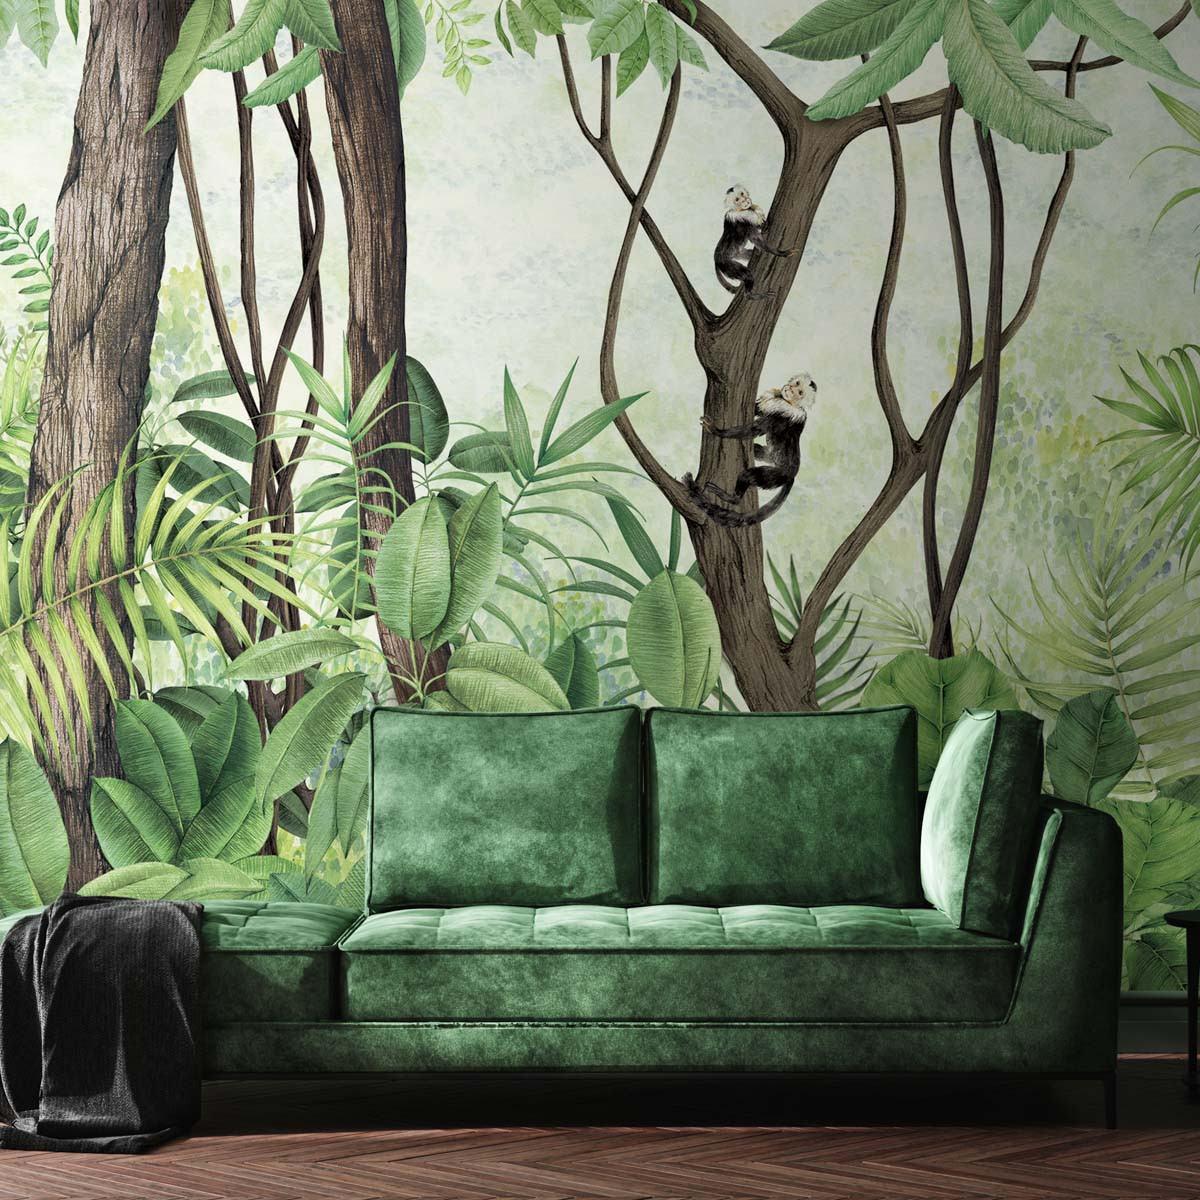 Coordonne Casa De Vidro Mural Wallpaper - Clearance Design - 9000050V (50% Off RRP) - WxH - 165x215cm